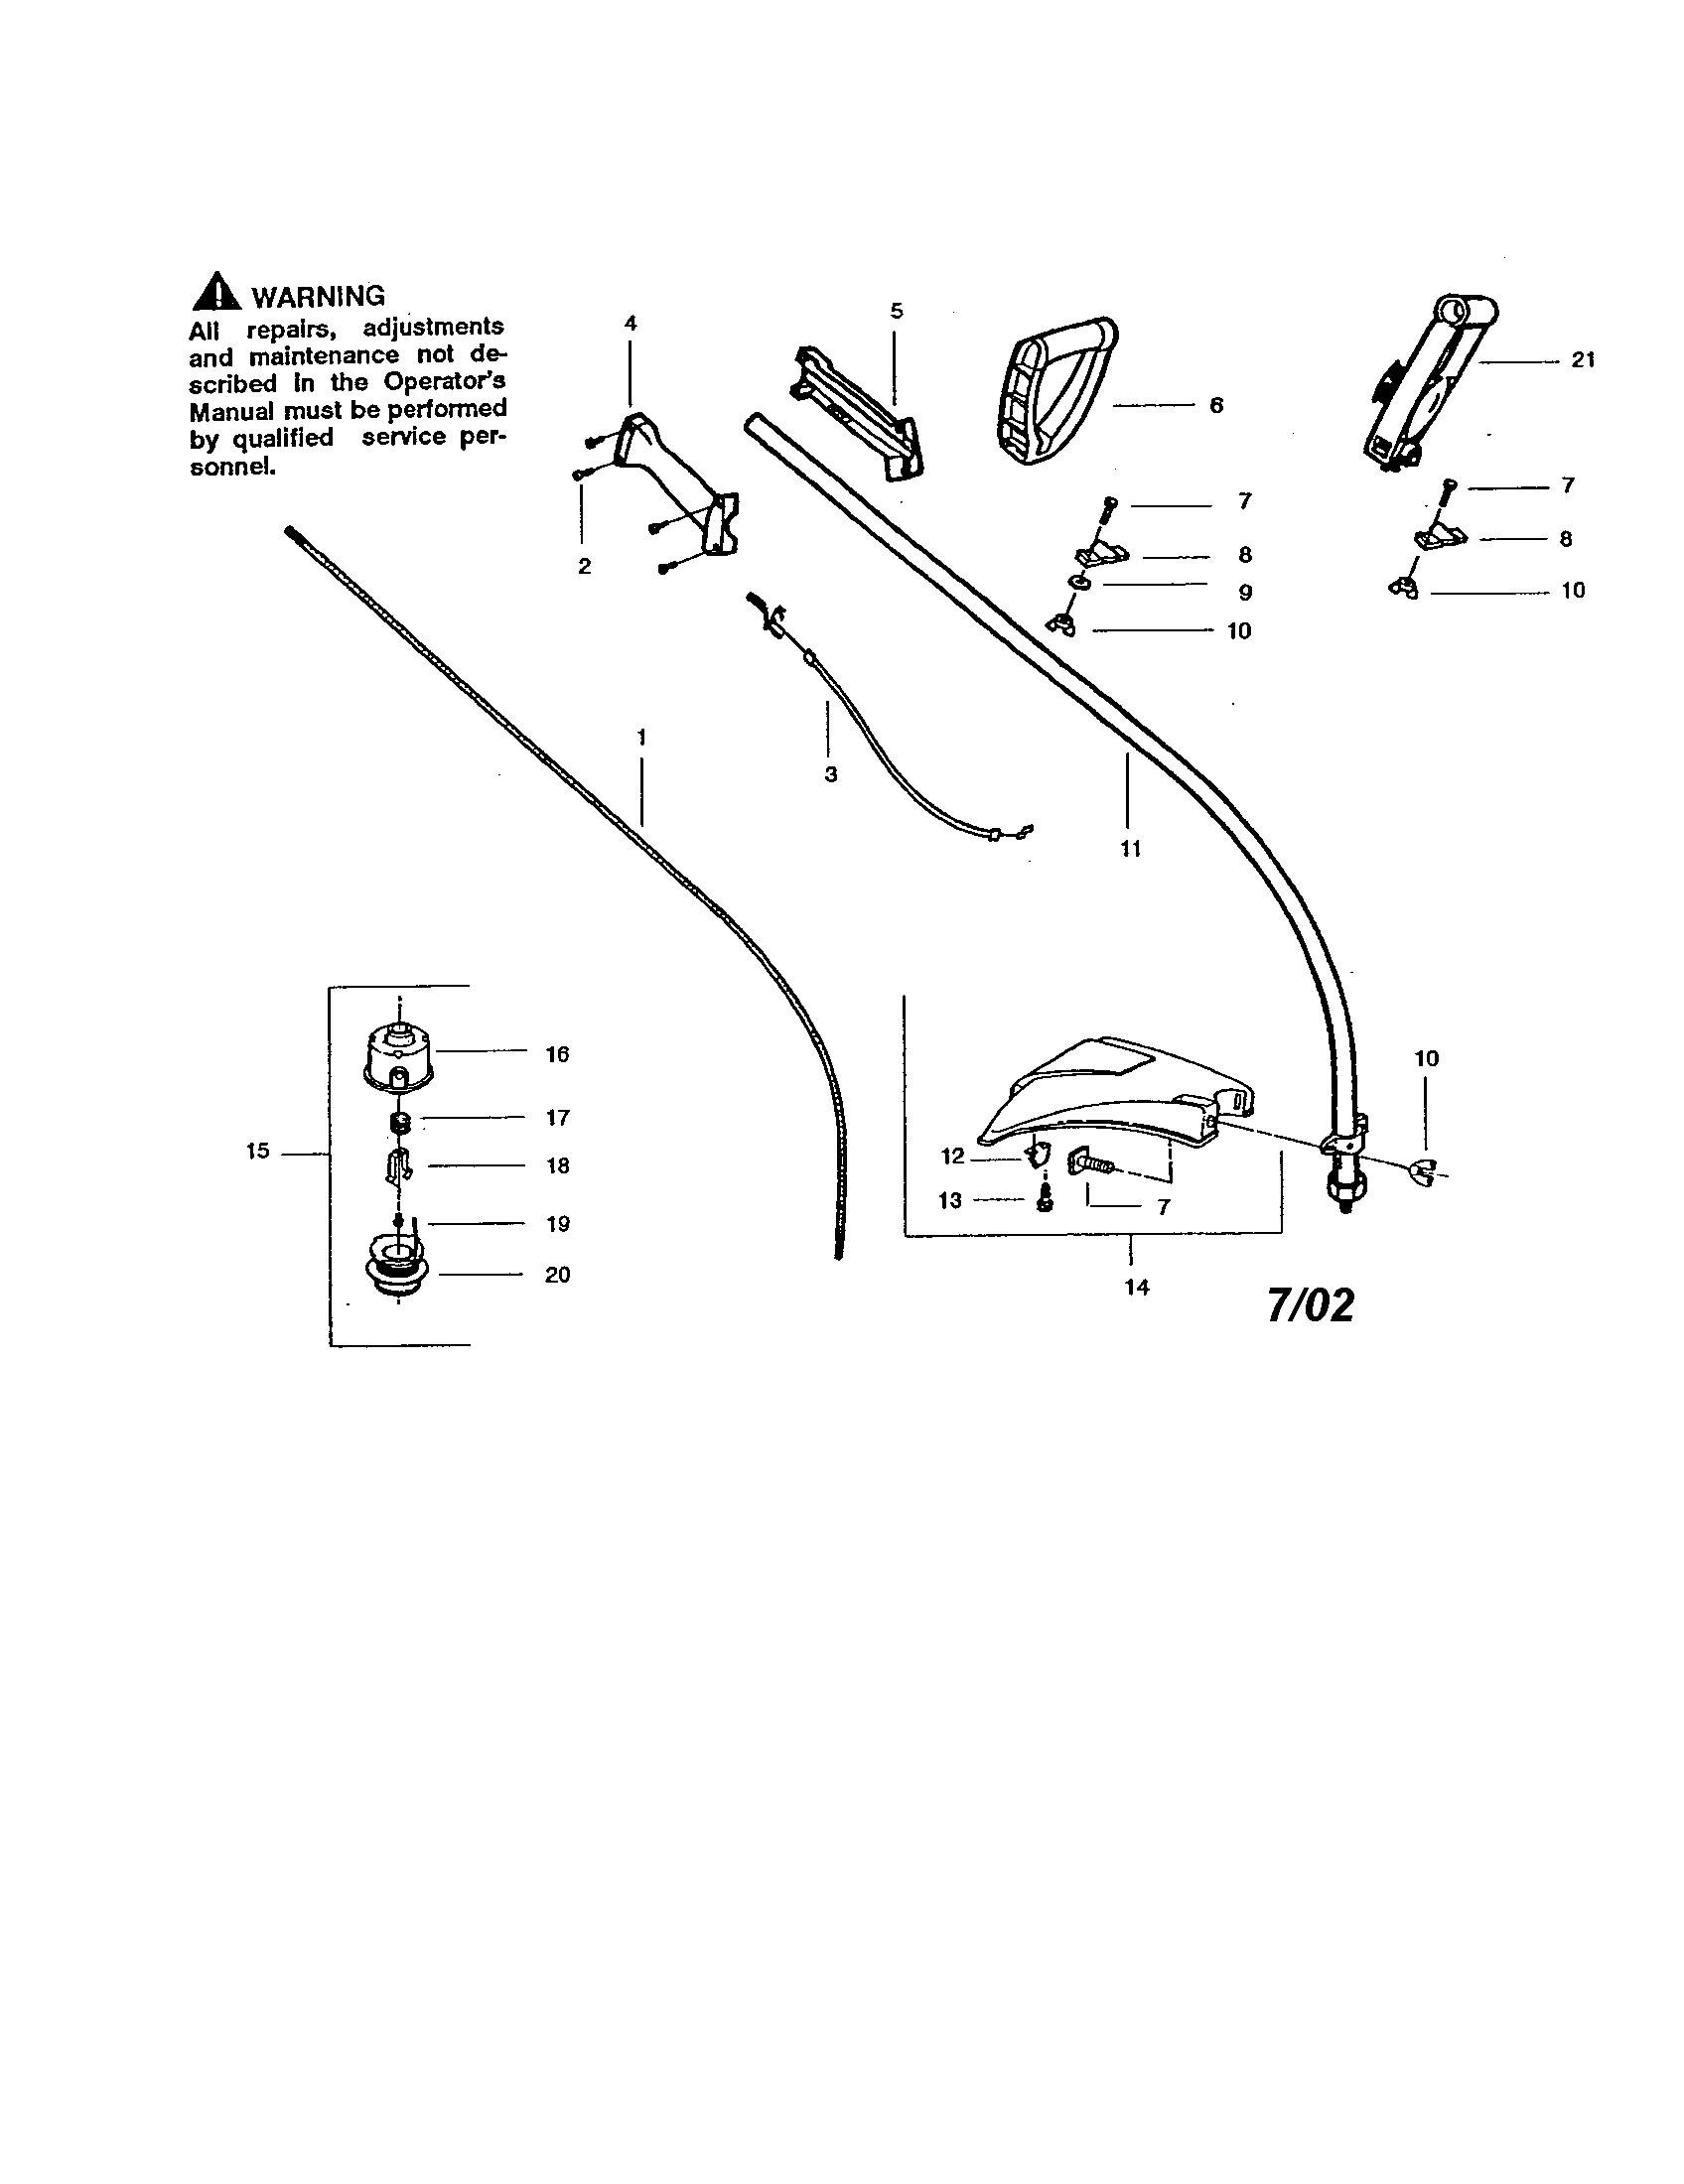 Stihl Fs130r Parts Diagram